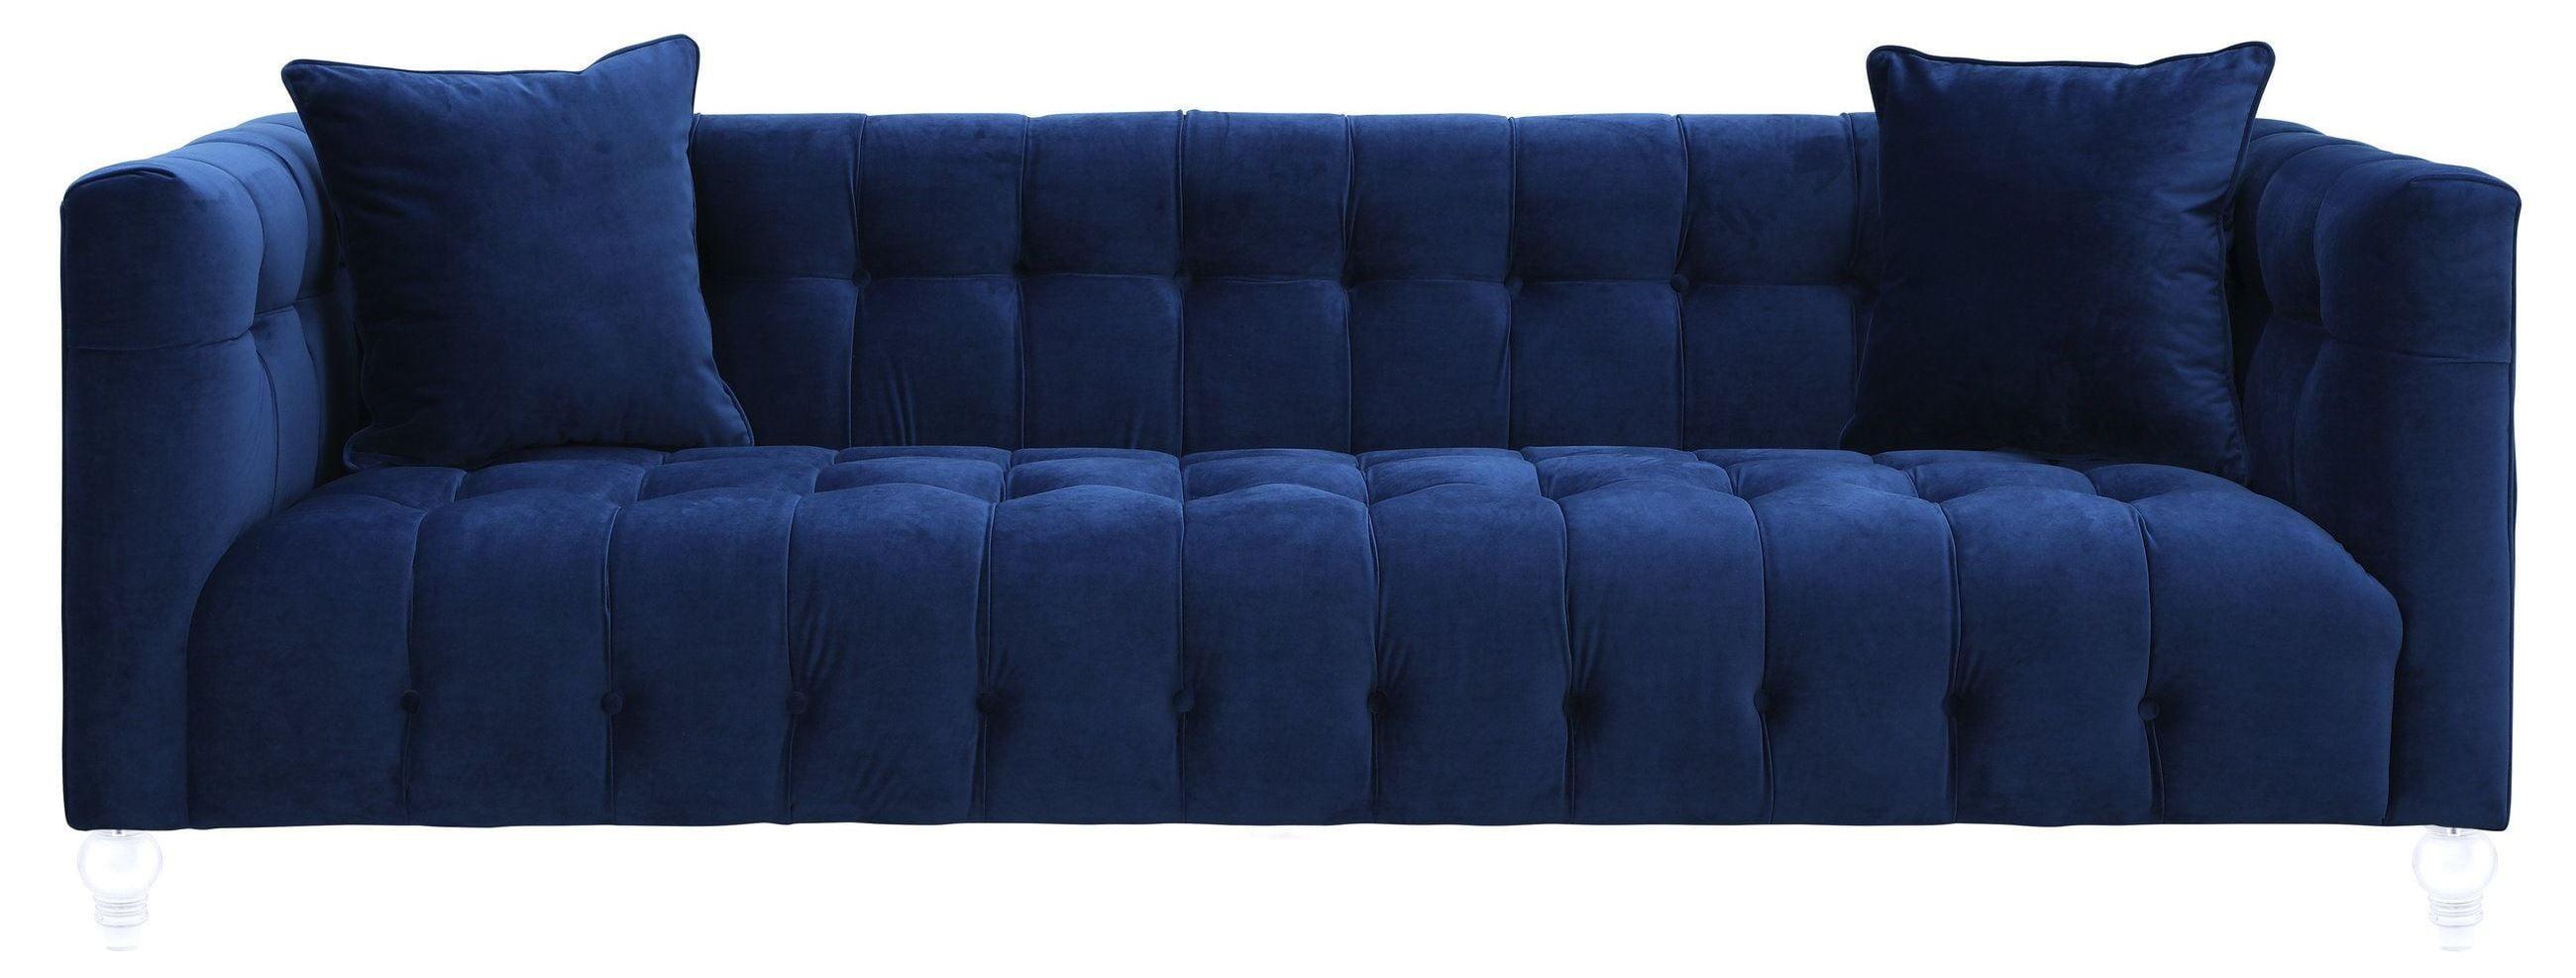 Bea Navy Velvet Sofa From Tov Tov S85 Coleman Furniture